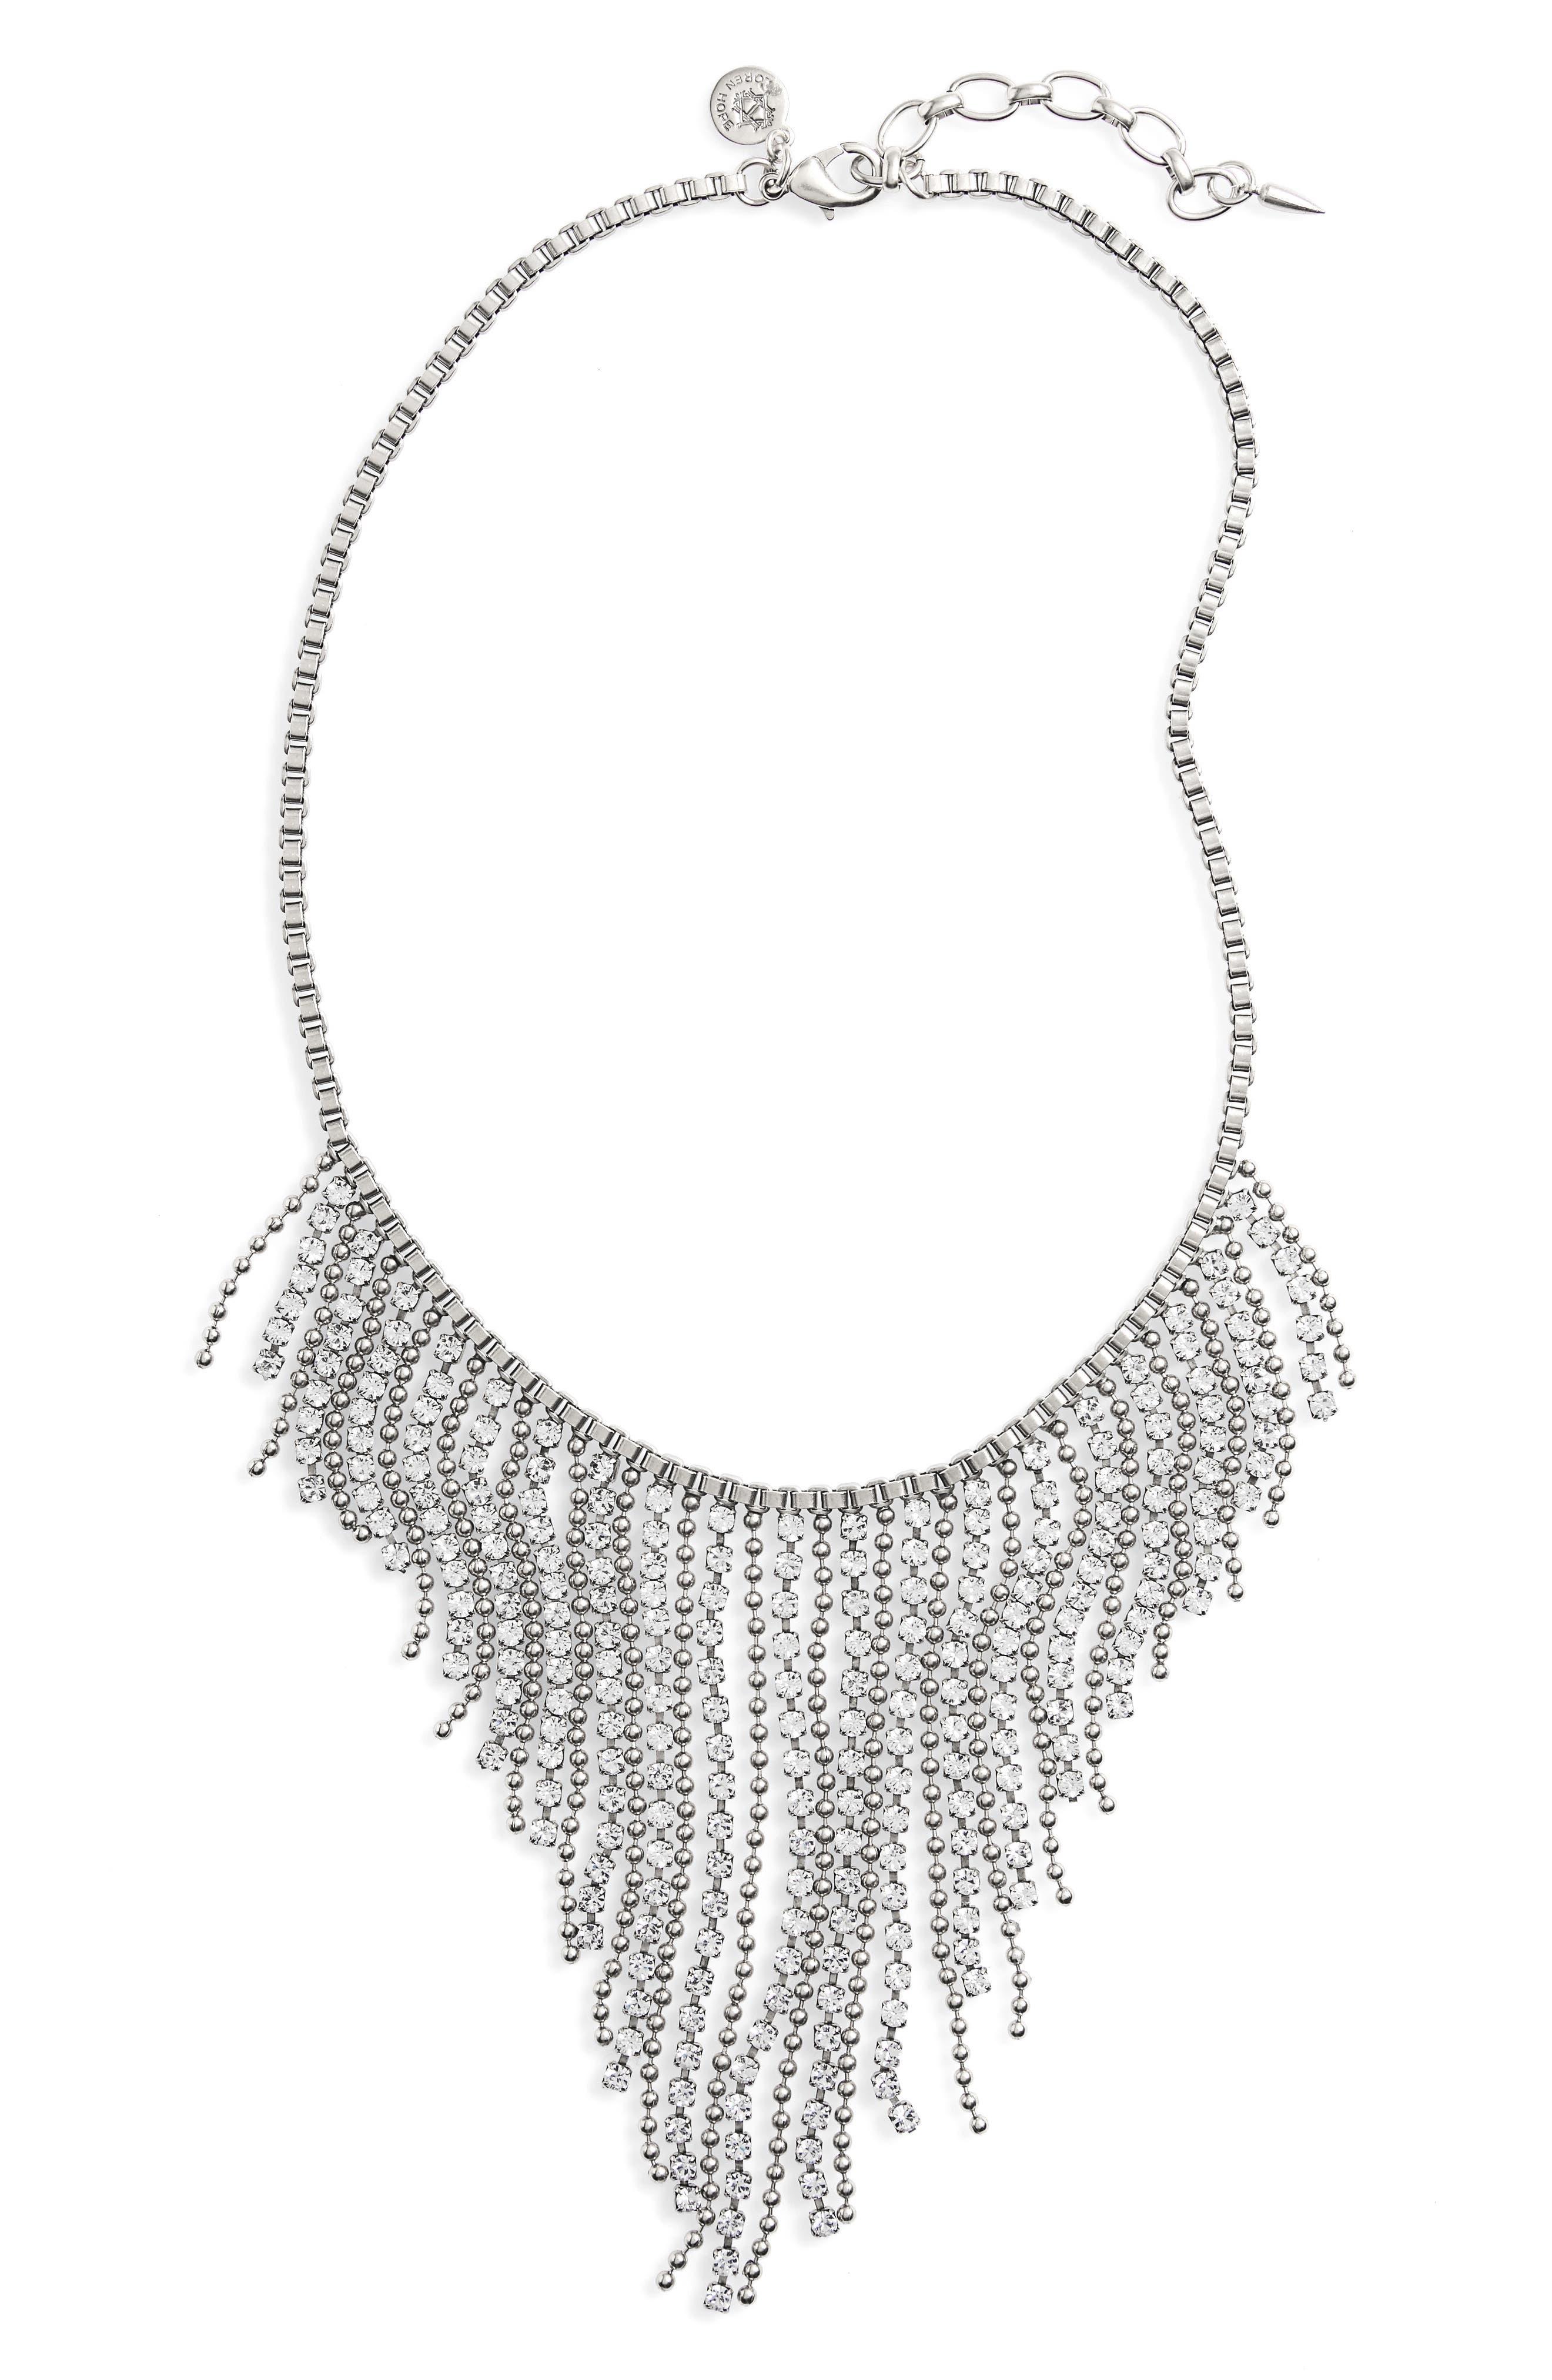 Joanna Frontal Necklace,                             Main thumbnail 1, color,                             Silver/ Crystal